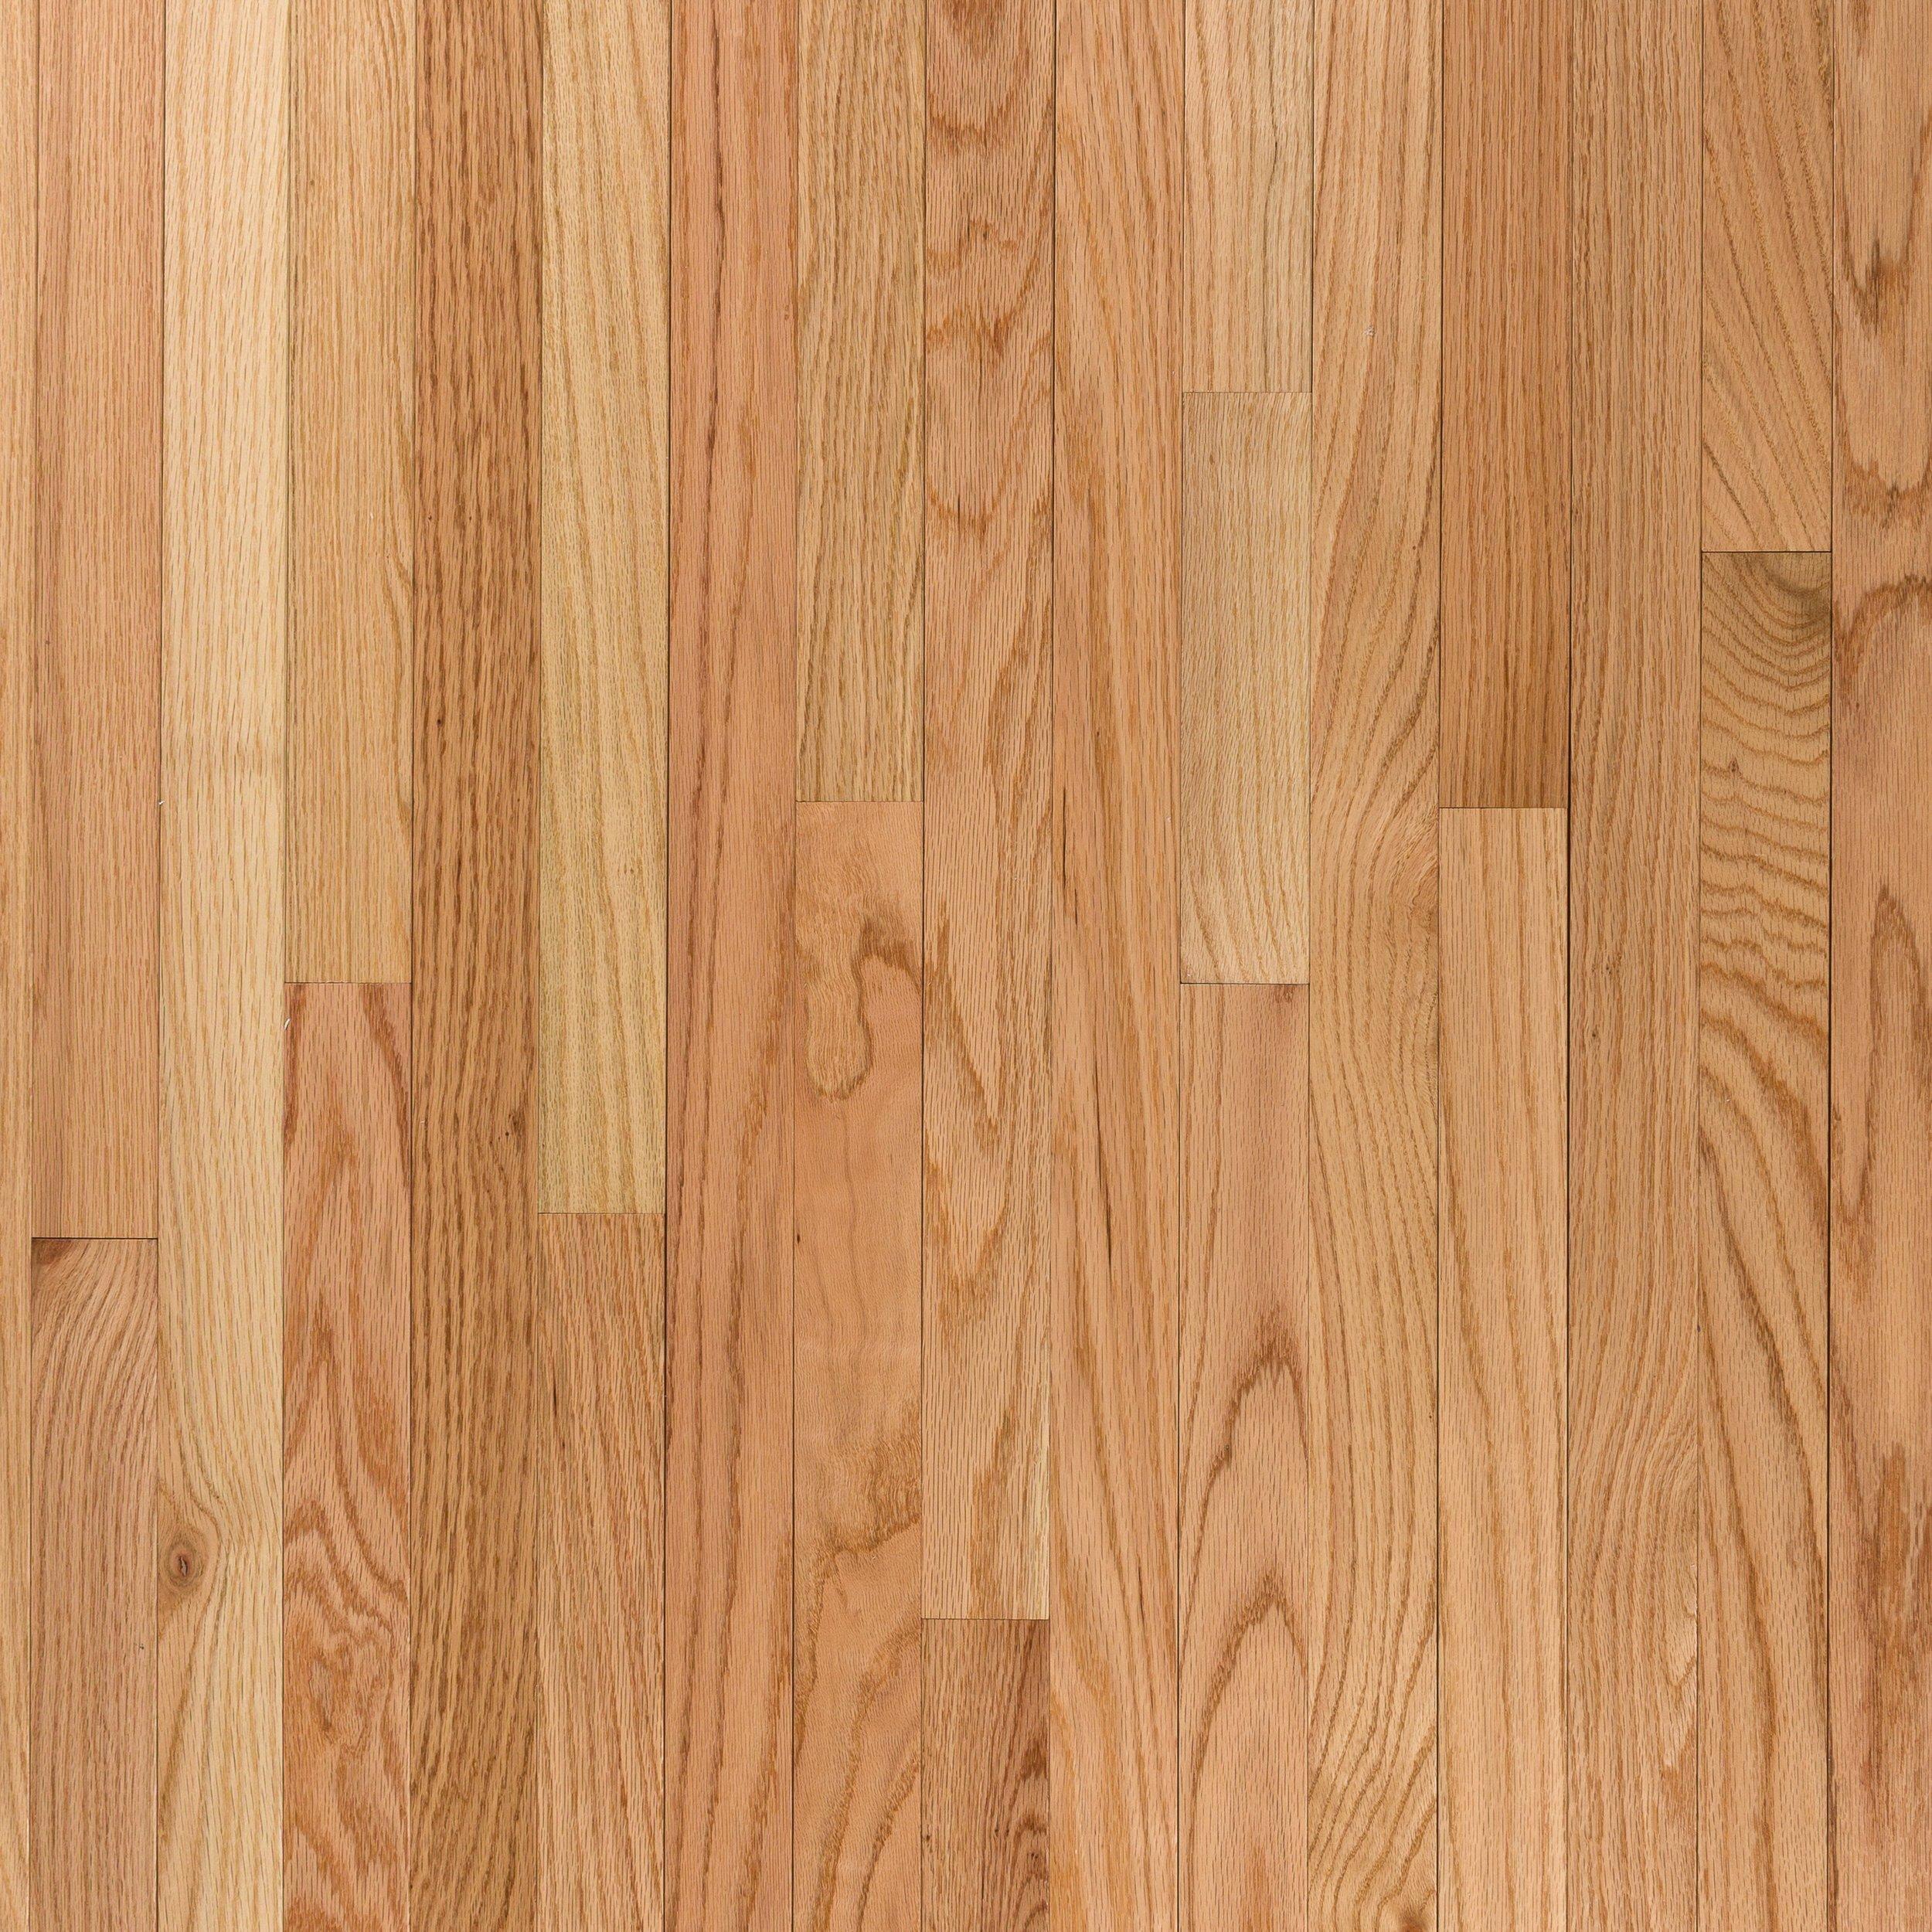 Natural Select Oak High Gloss Solid Hardwood In 2020 Hardwood